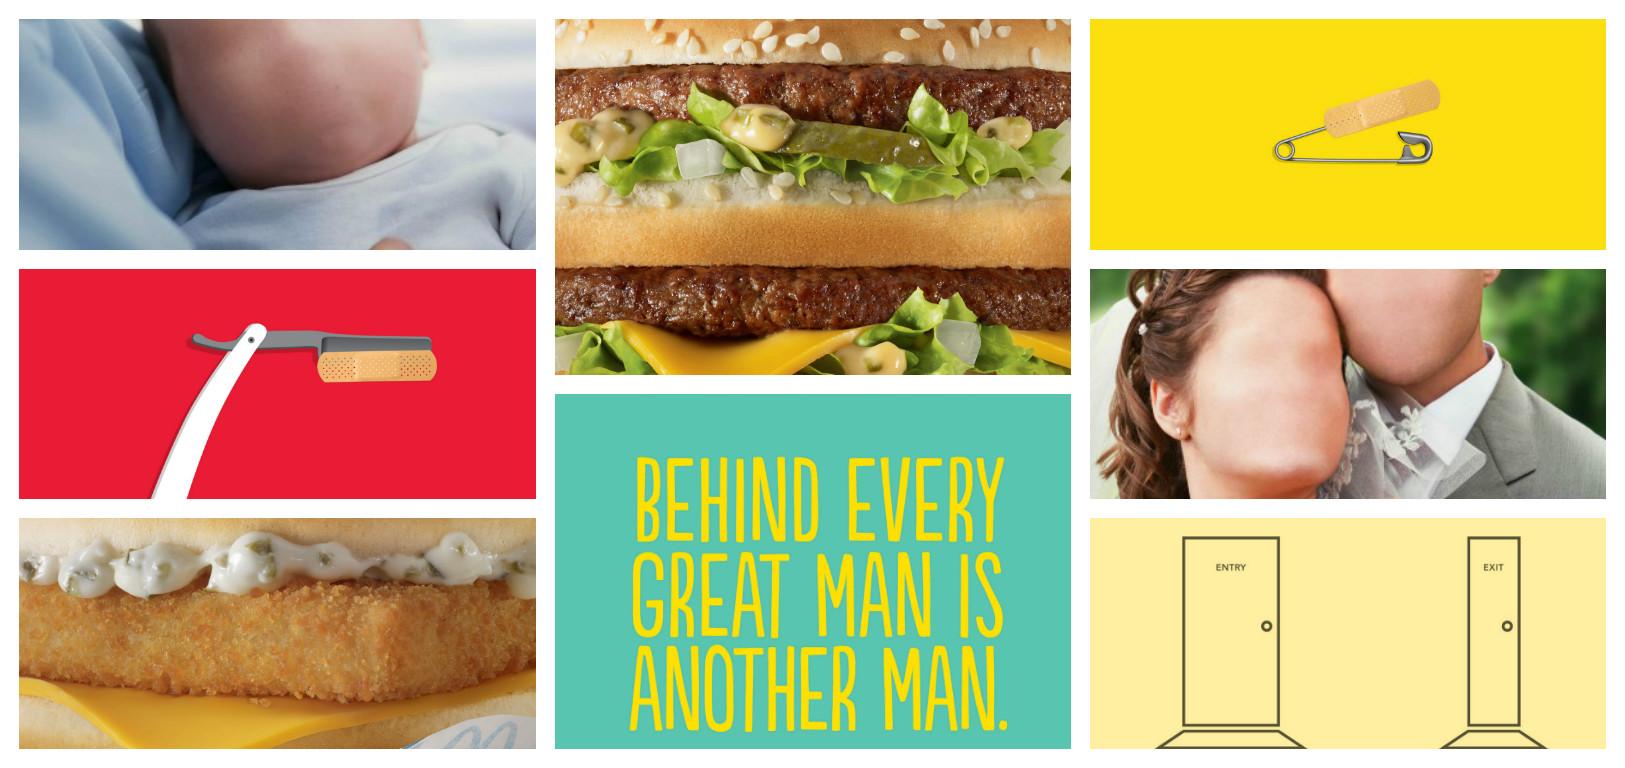 Najzanimljivije svetske print reklame [22 jul - 04.avgust 2013.]